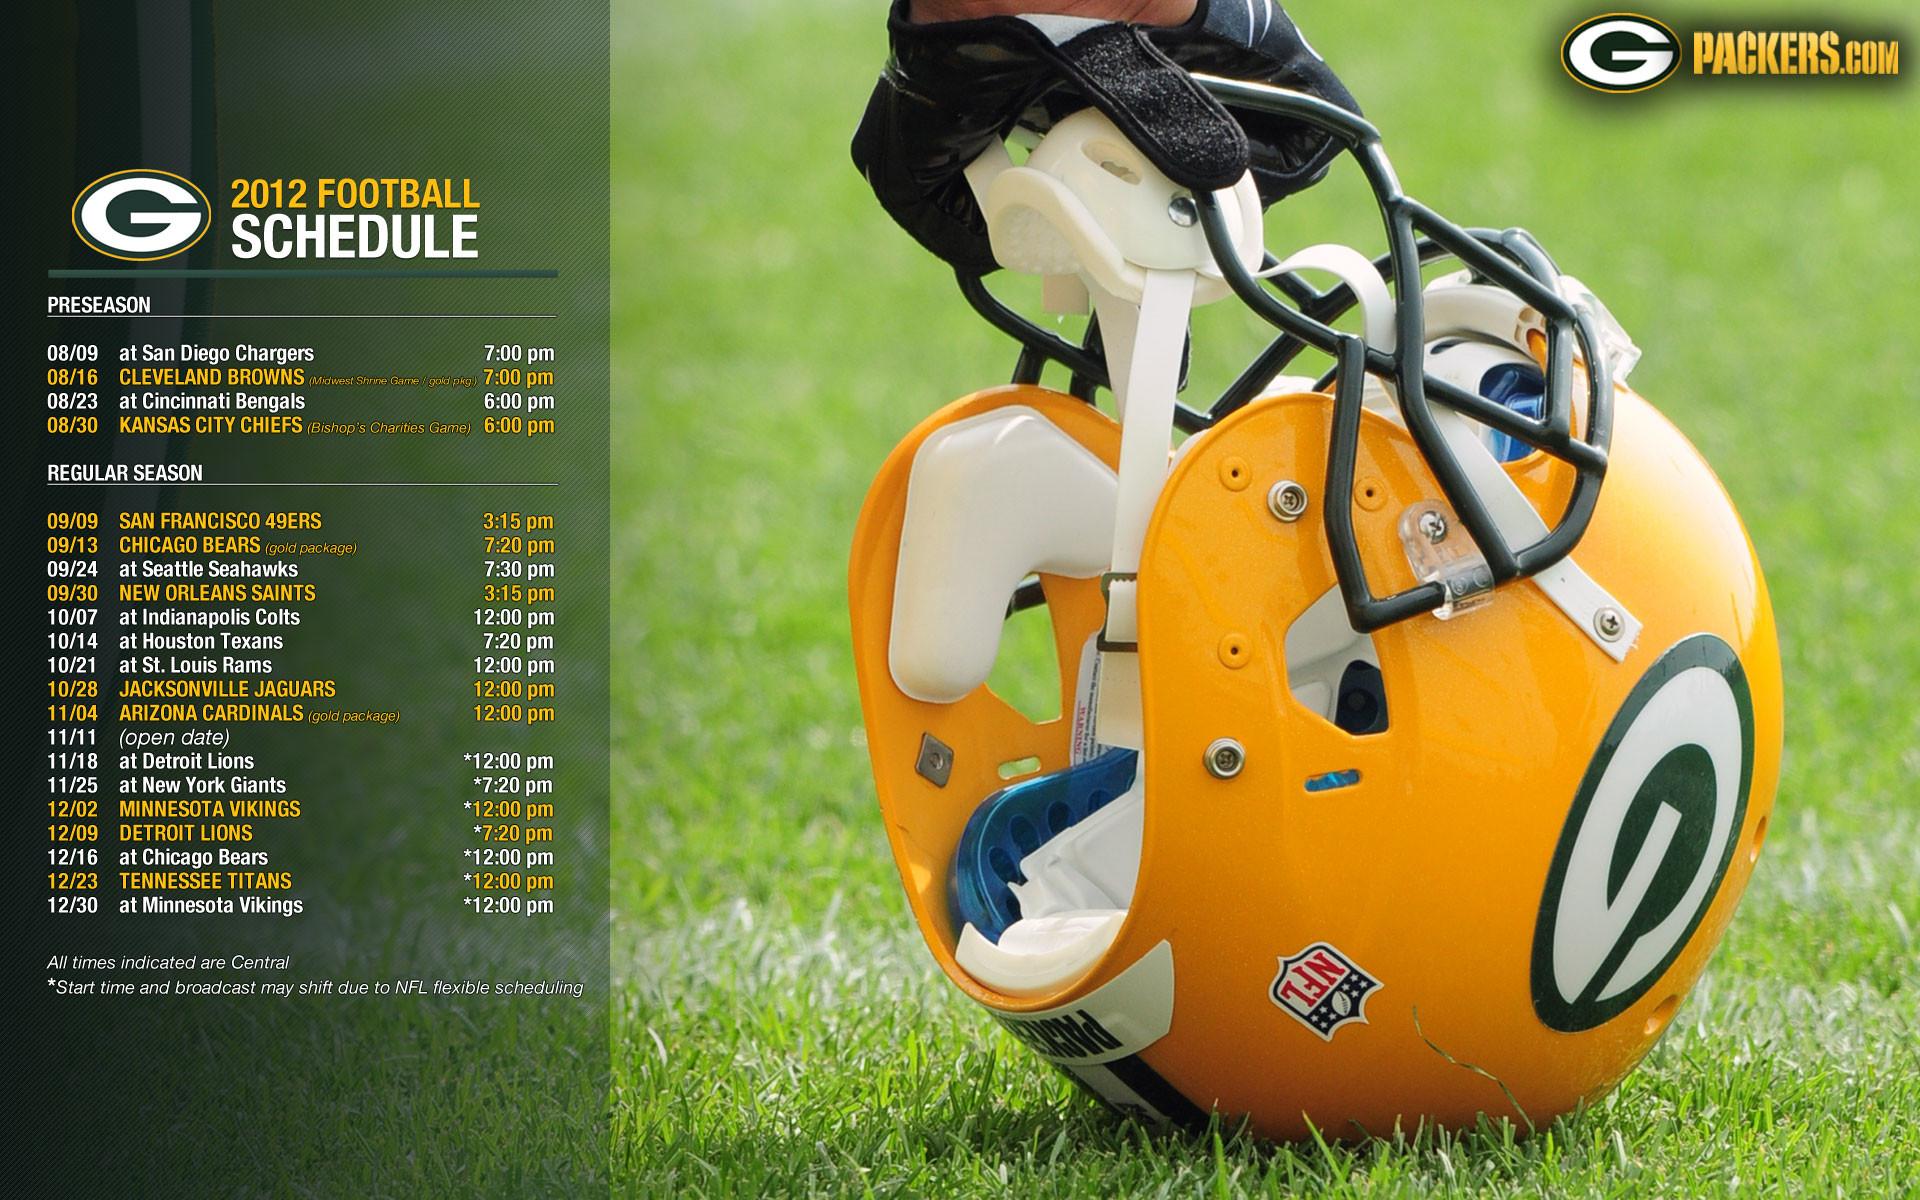 Green Bay Packers Desktop Background Wallpapers Packers Logo